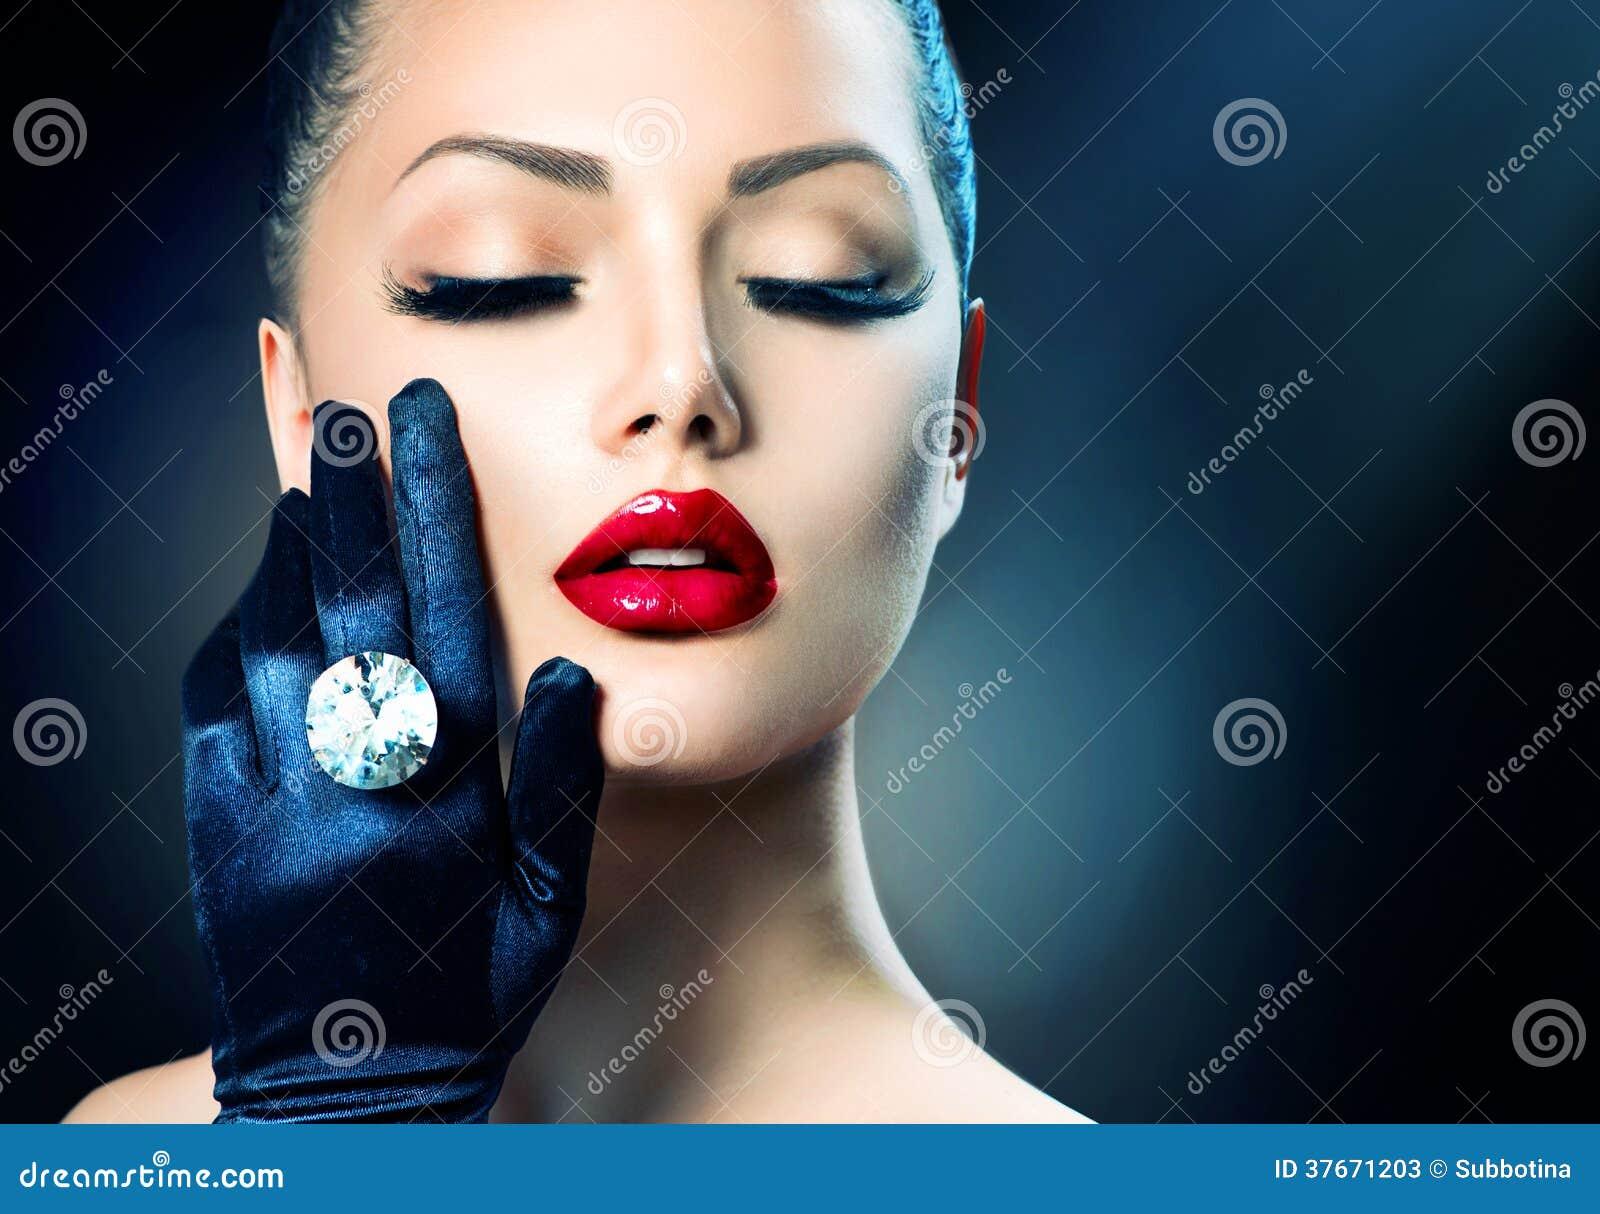 Beauty Fashion Glamour Girl Stock Image